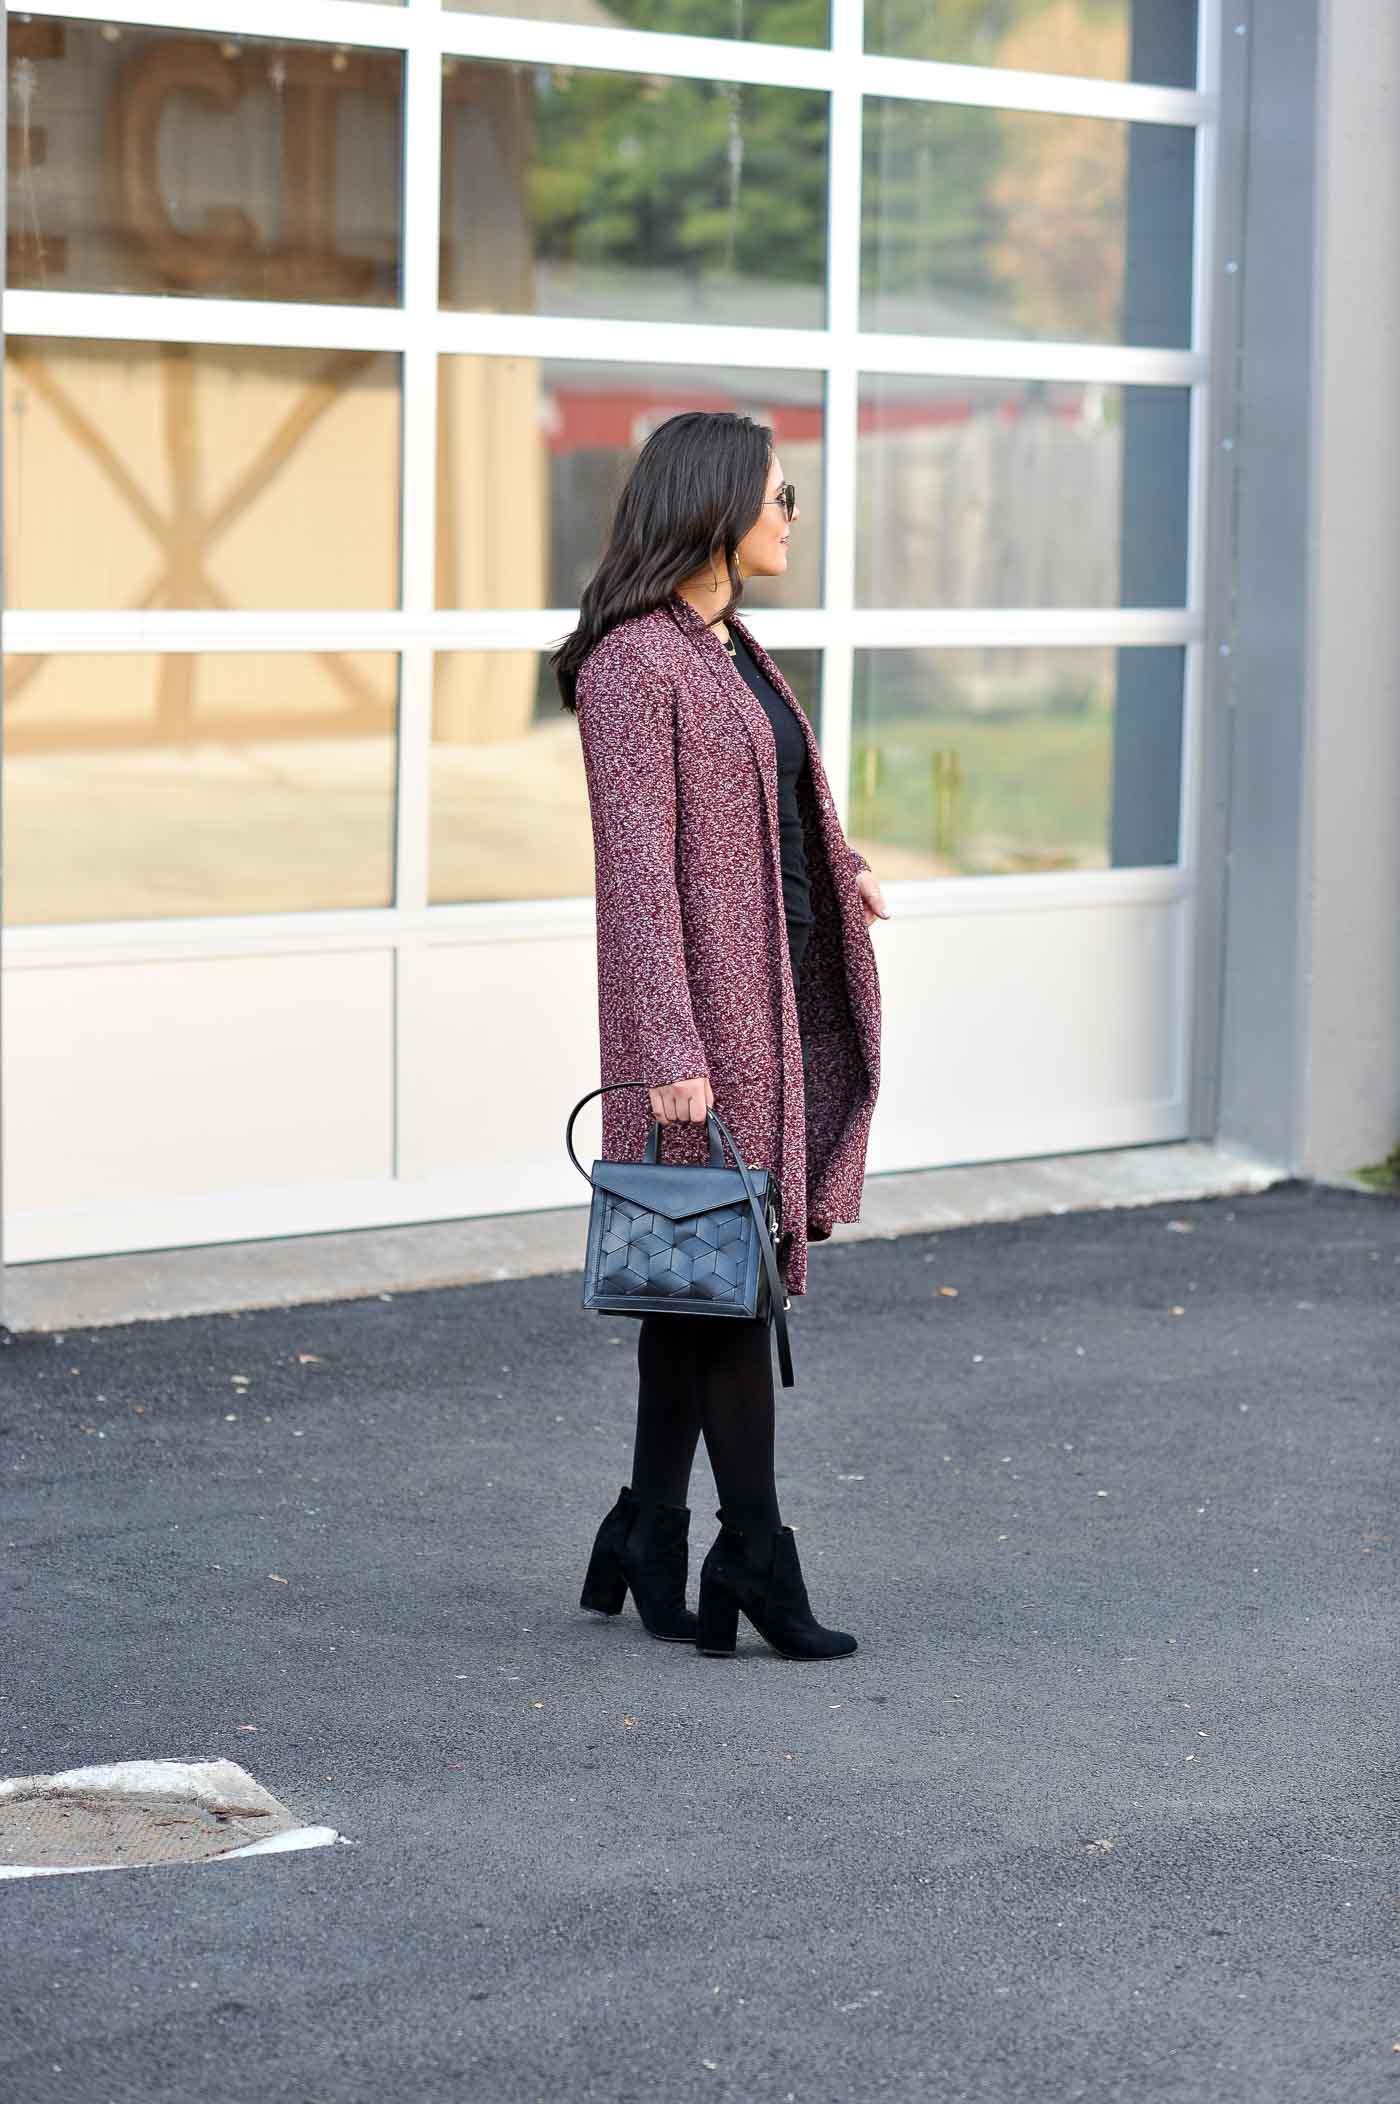 Black sweater dress with cardigan, best black tights